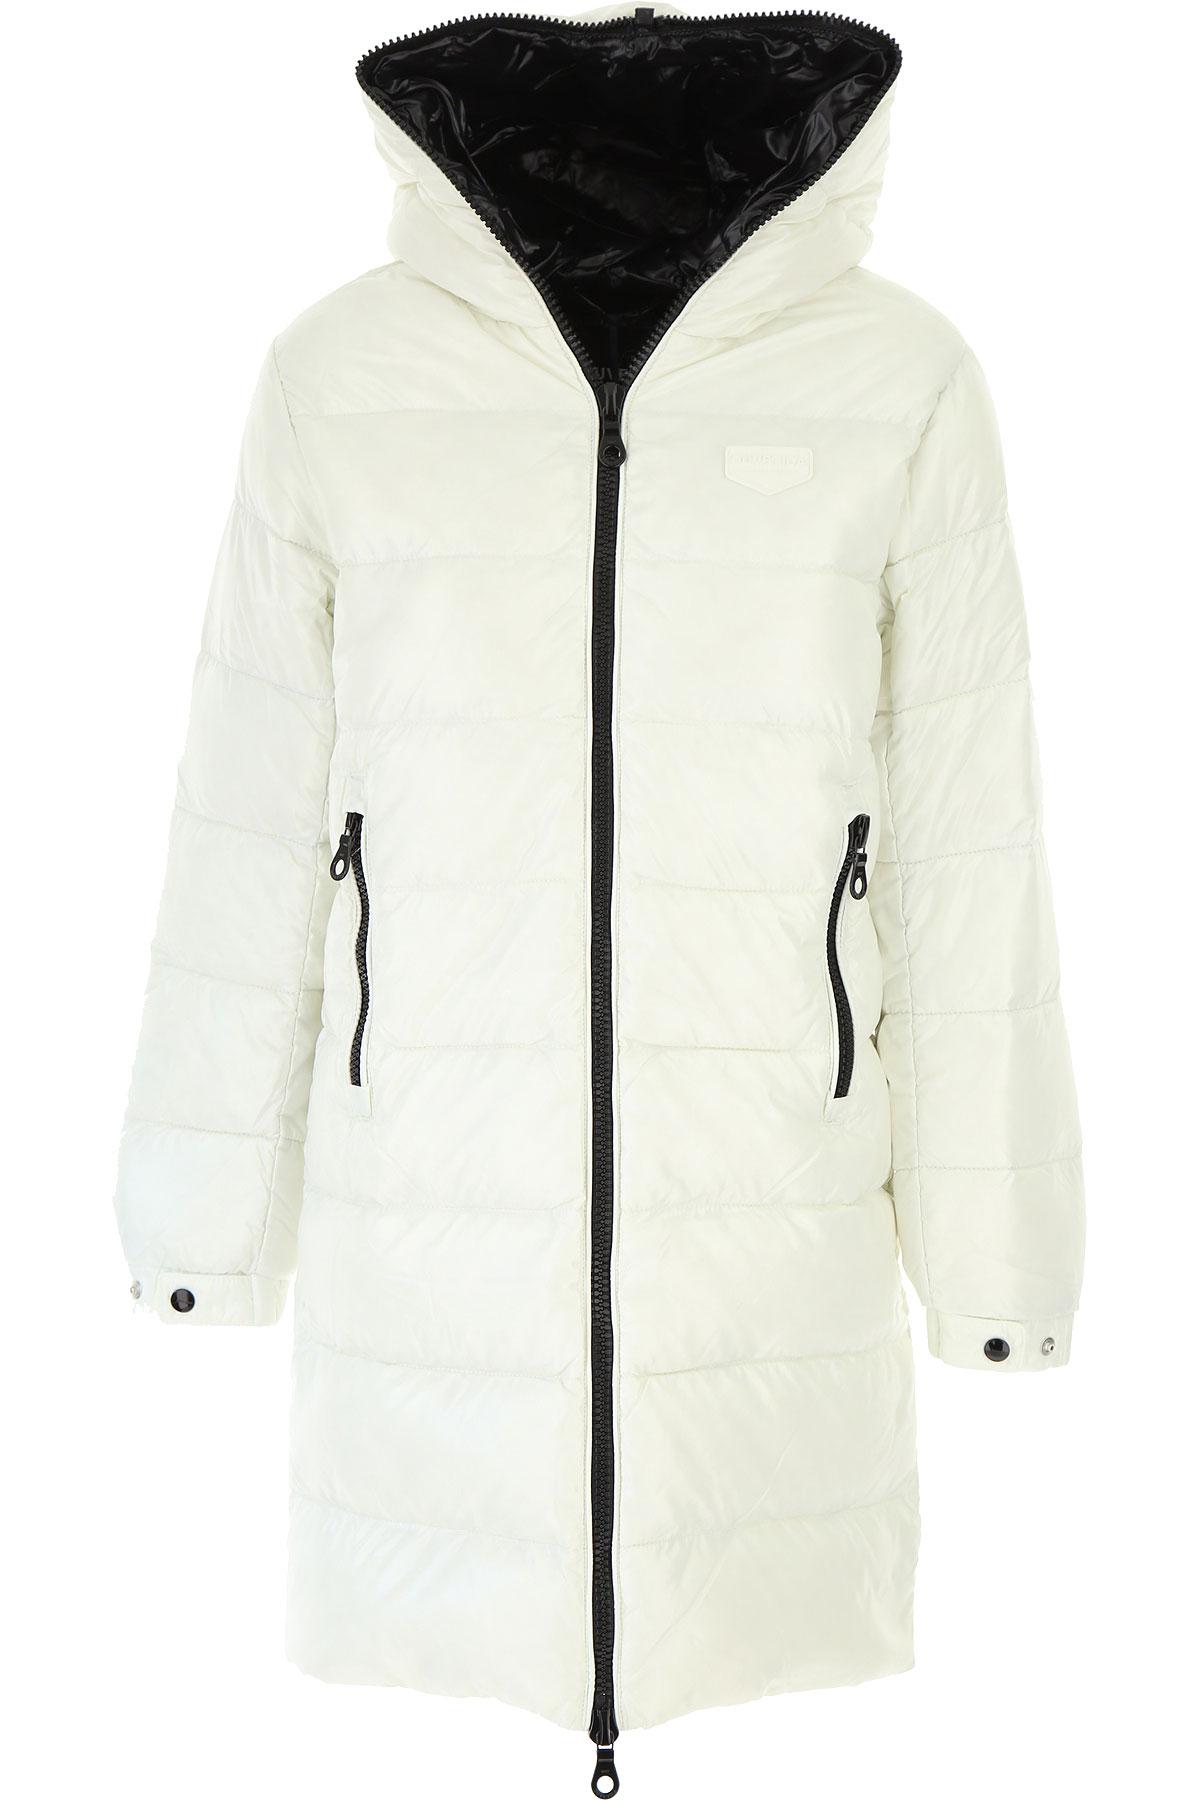 Duvetica Down Jacket for Women, Puffer Ski Jacket On Sale, White, polyamide, 2019, 2 6